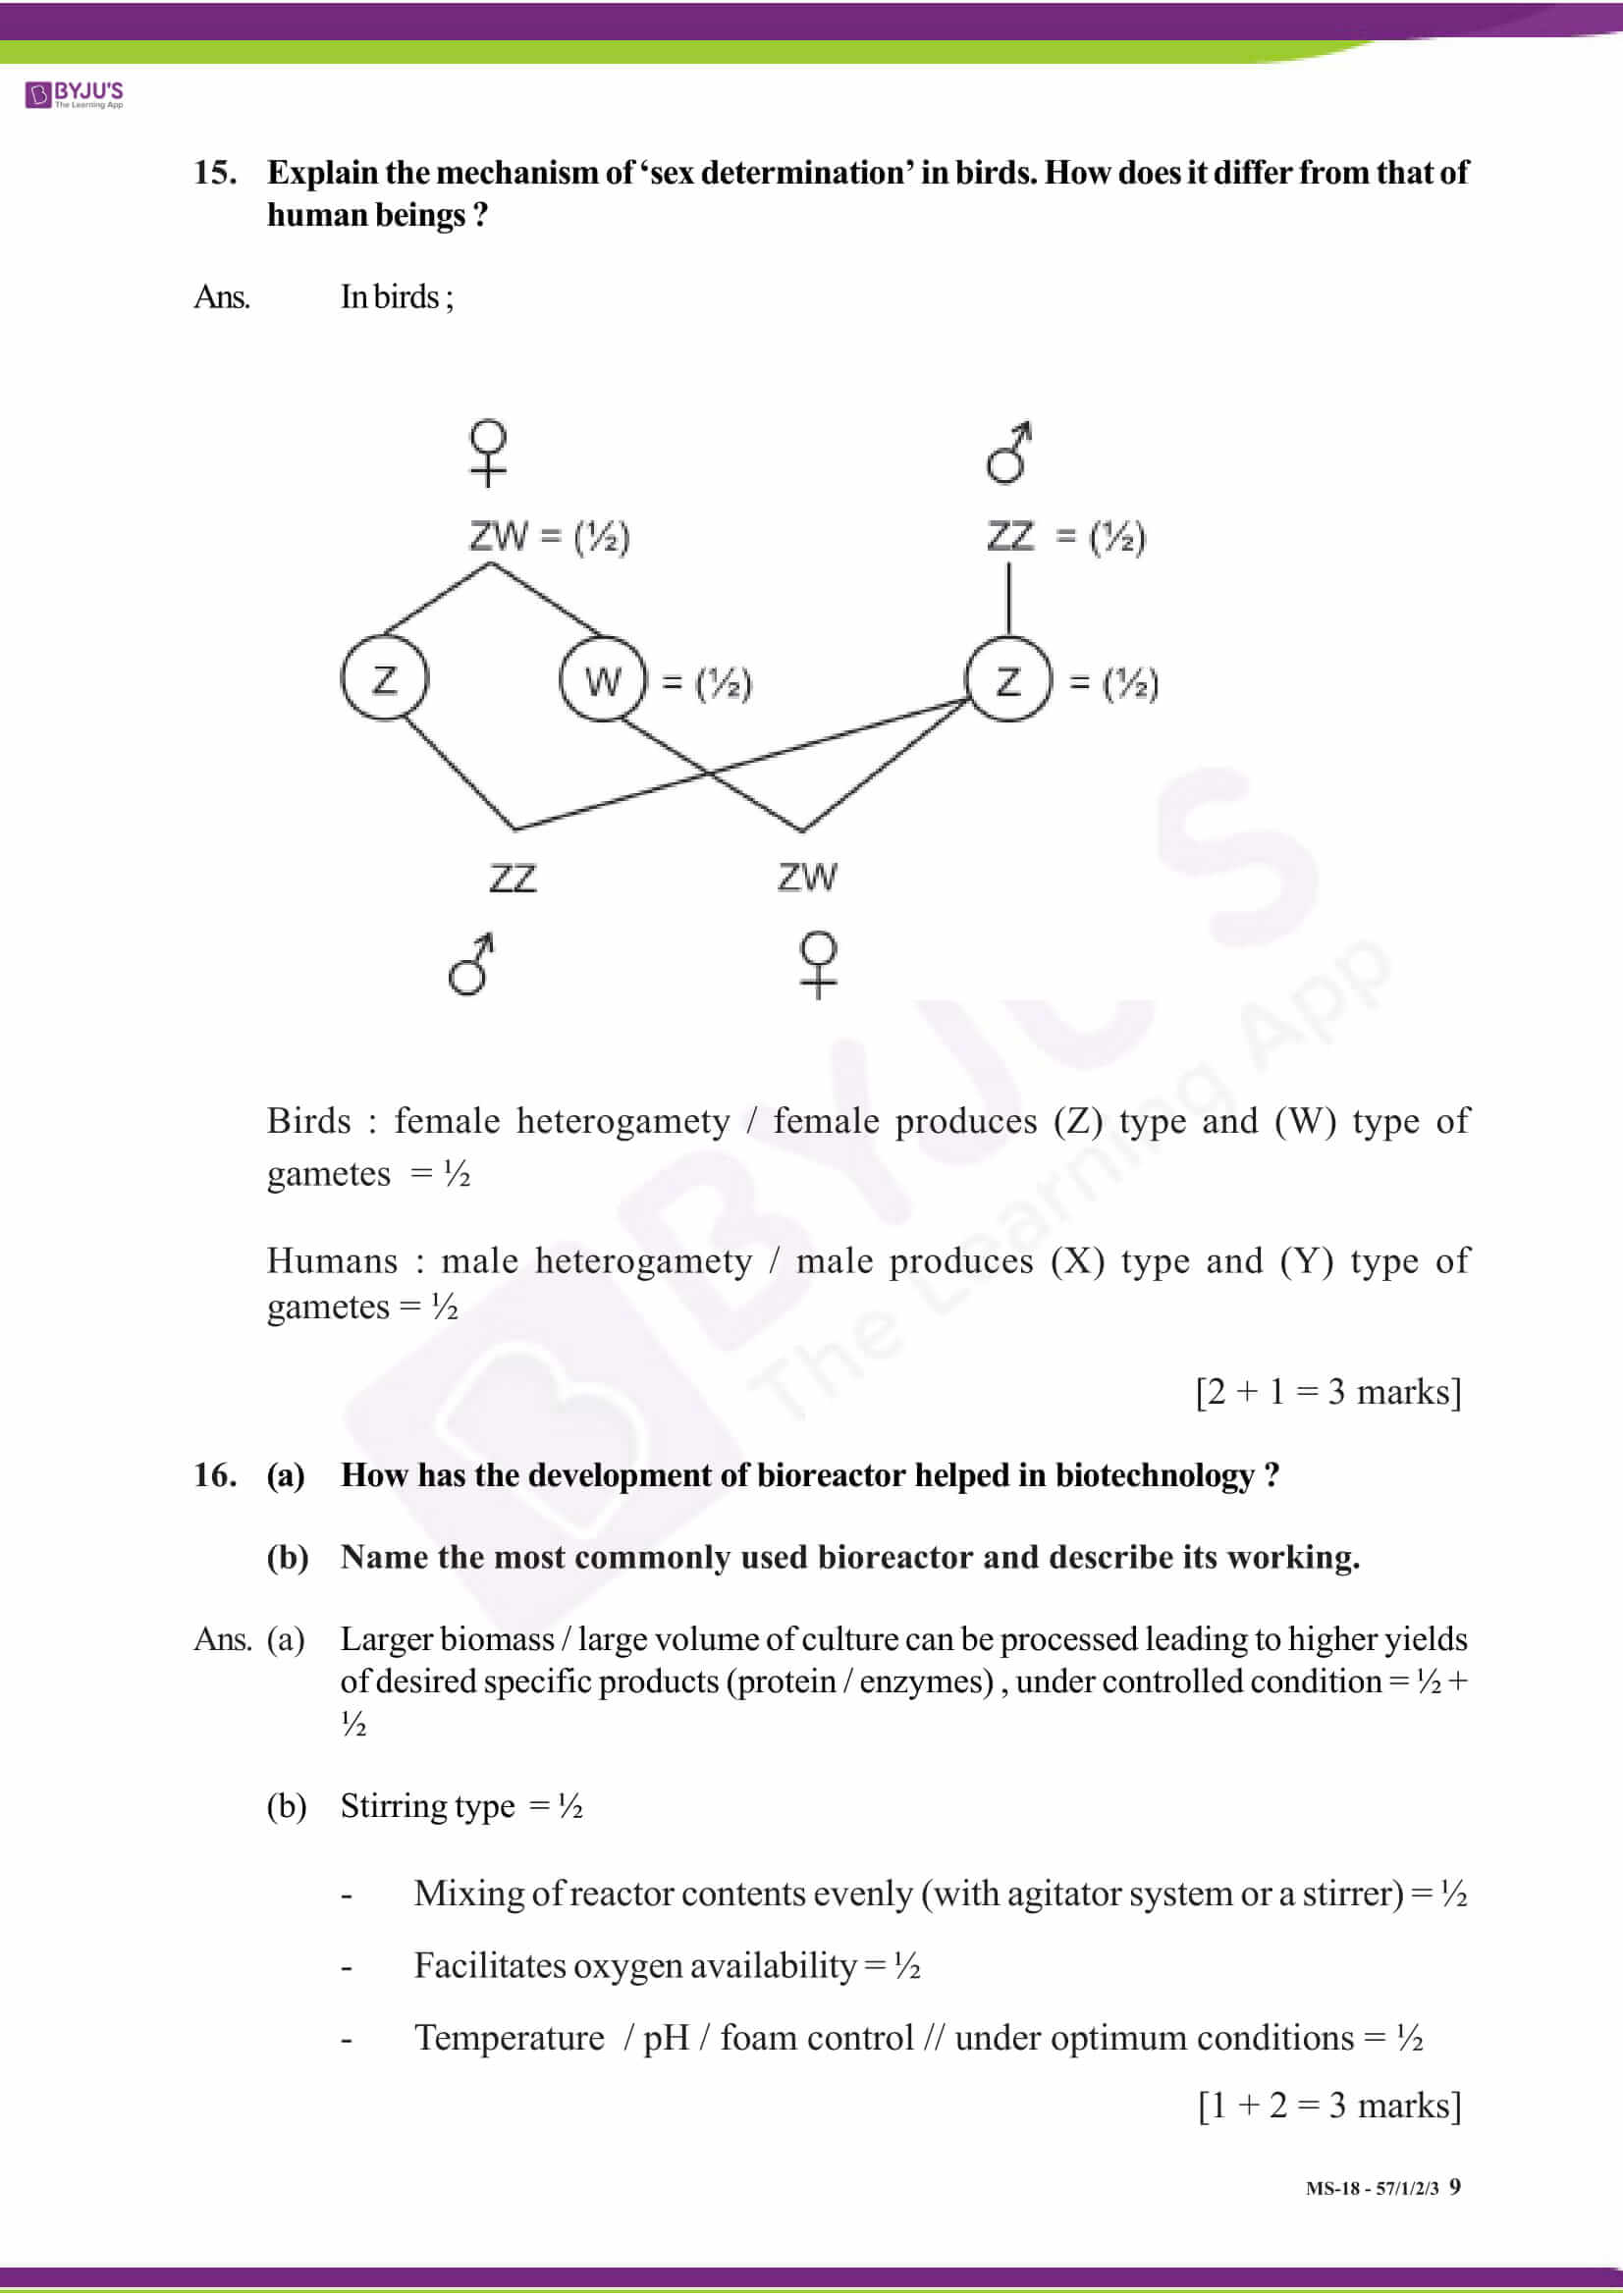 cbse class 12 solution 2018 bio set 1